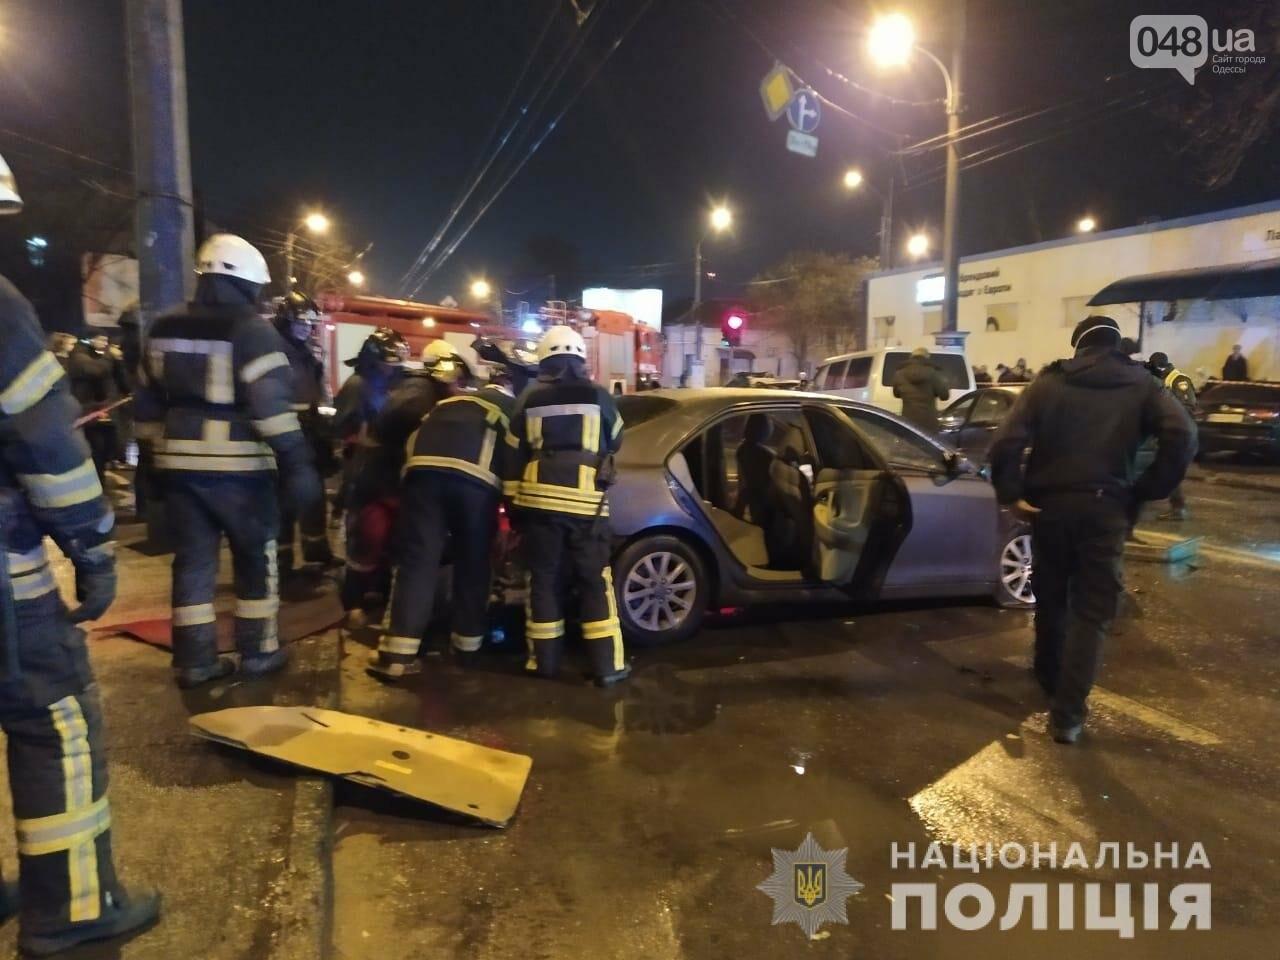 В Одессе в ночном ДТП погибли два человека, - ФОТО, ВИДЕО, ОБНОВЛЕНО, фото-5